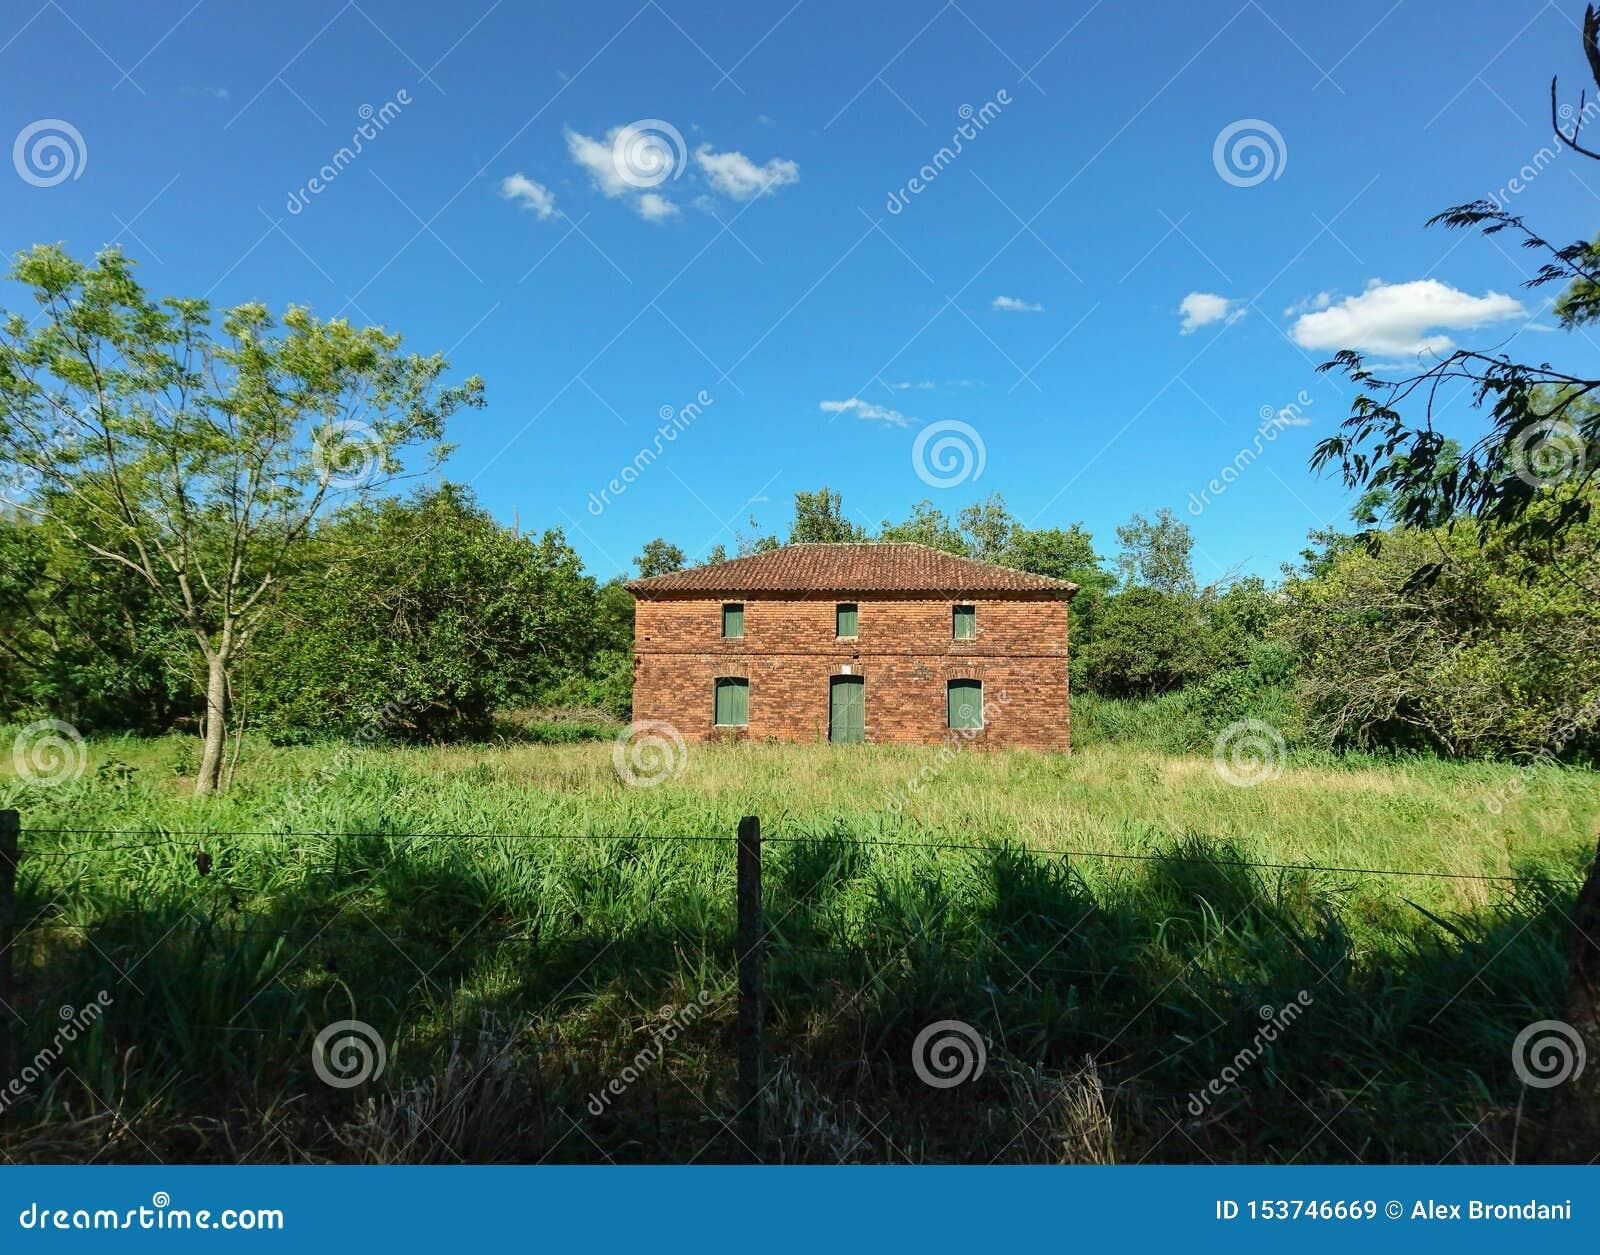 An abandoned brick House